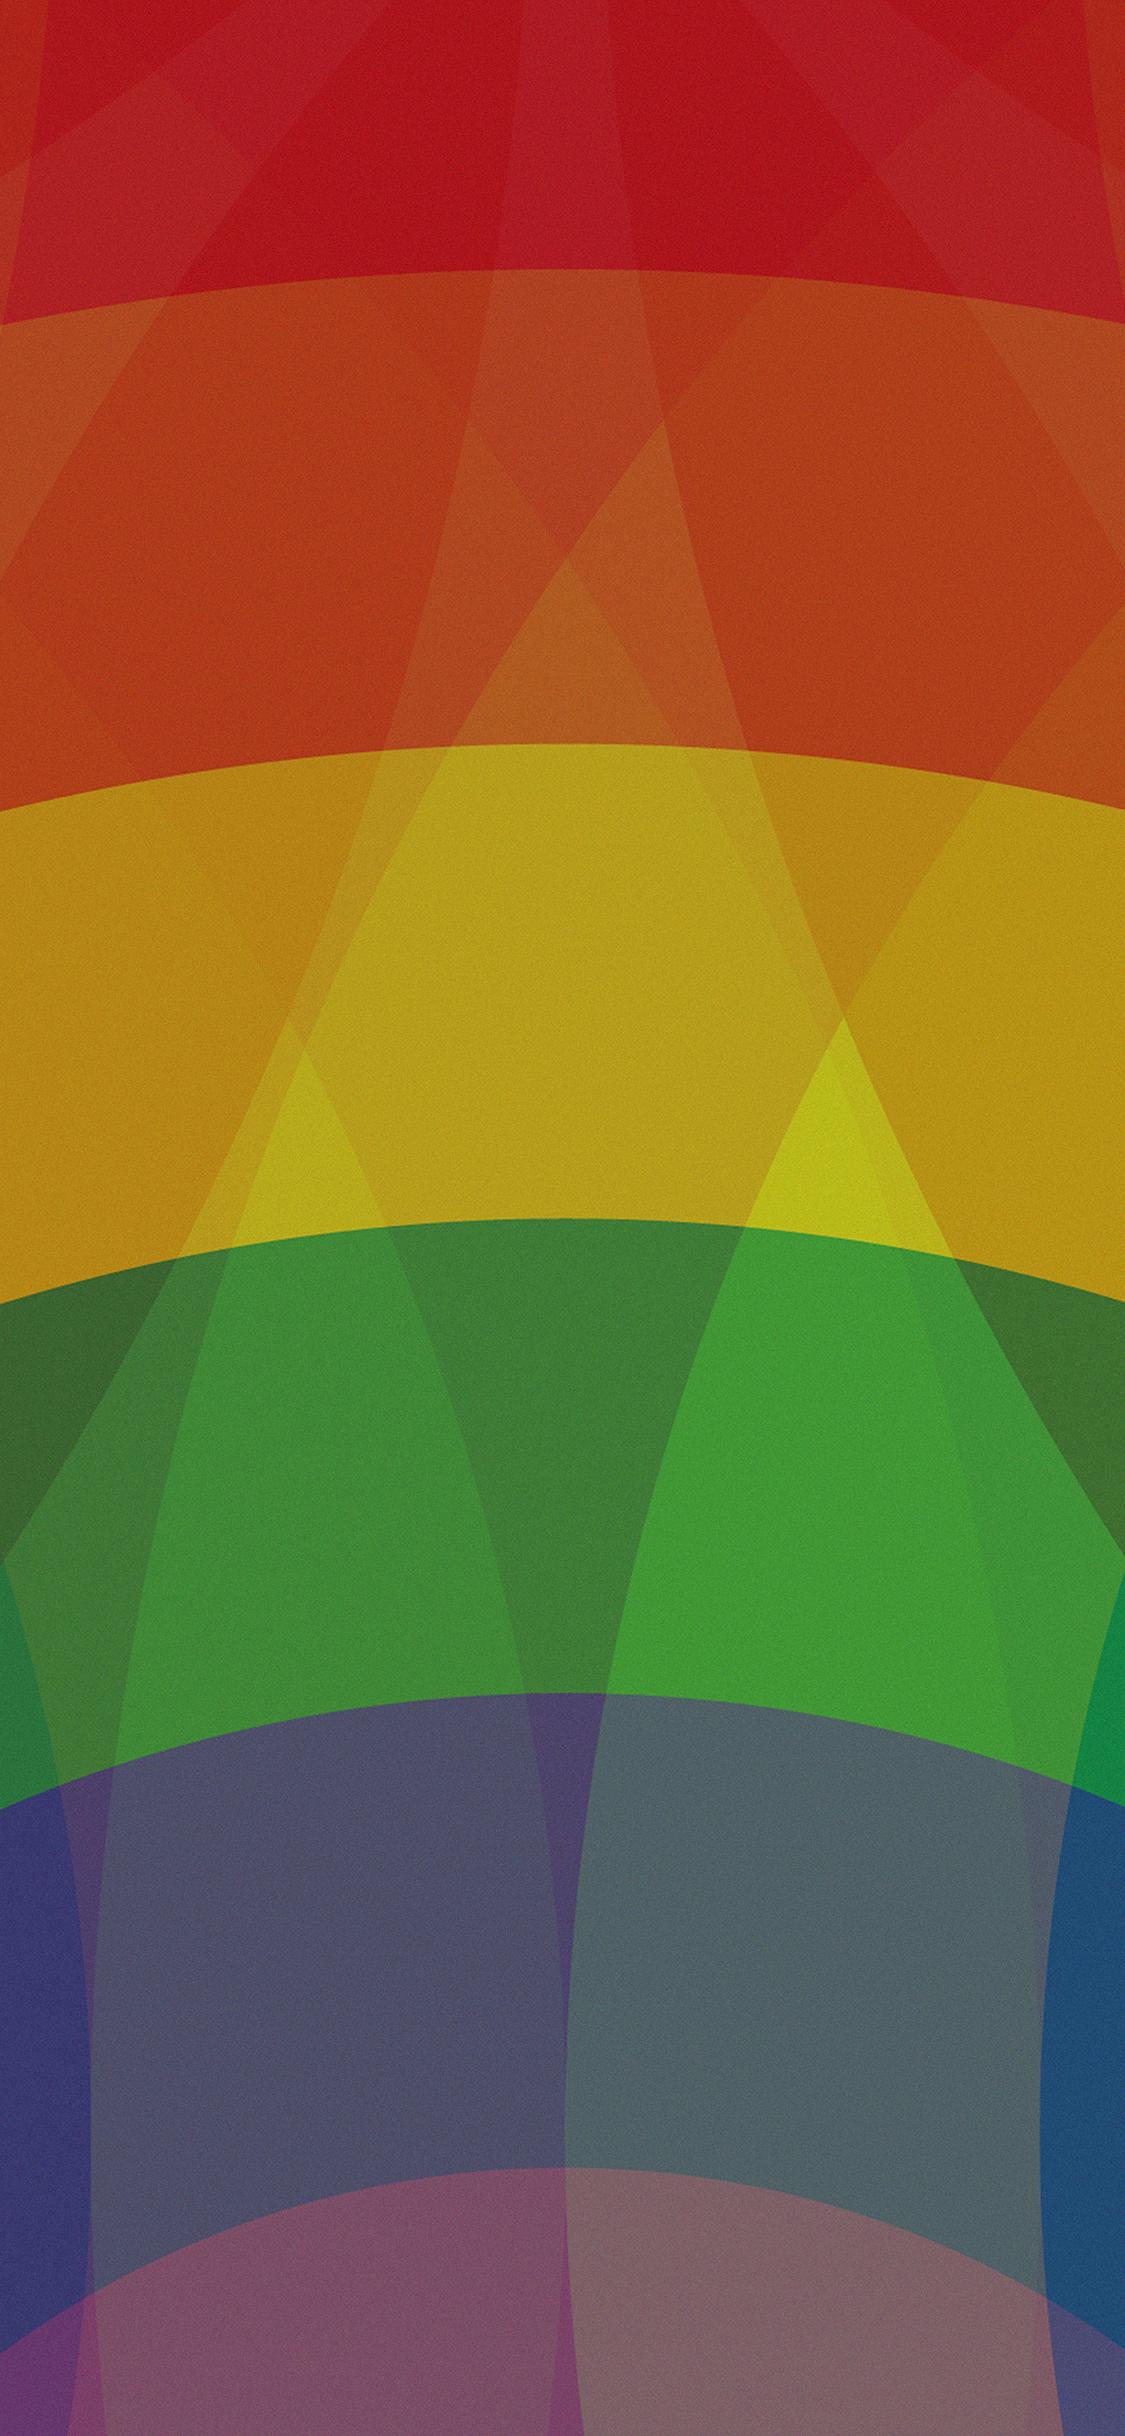 iPhoneXpapers.com-Apple-iPhone-wallpaper-vb07-wallpaper-rainbow-circle-pattern